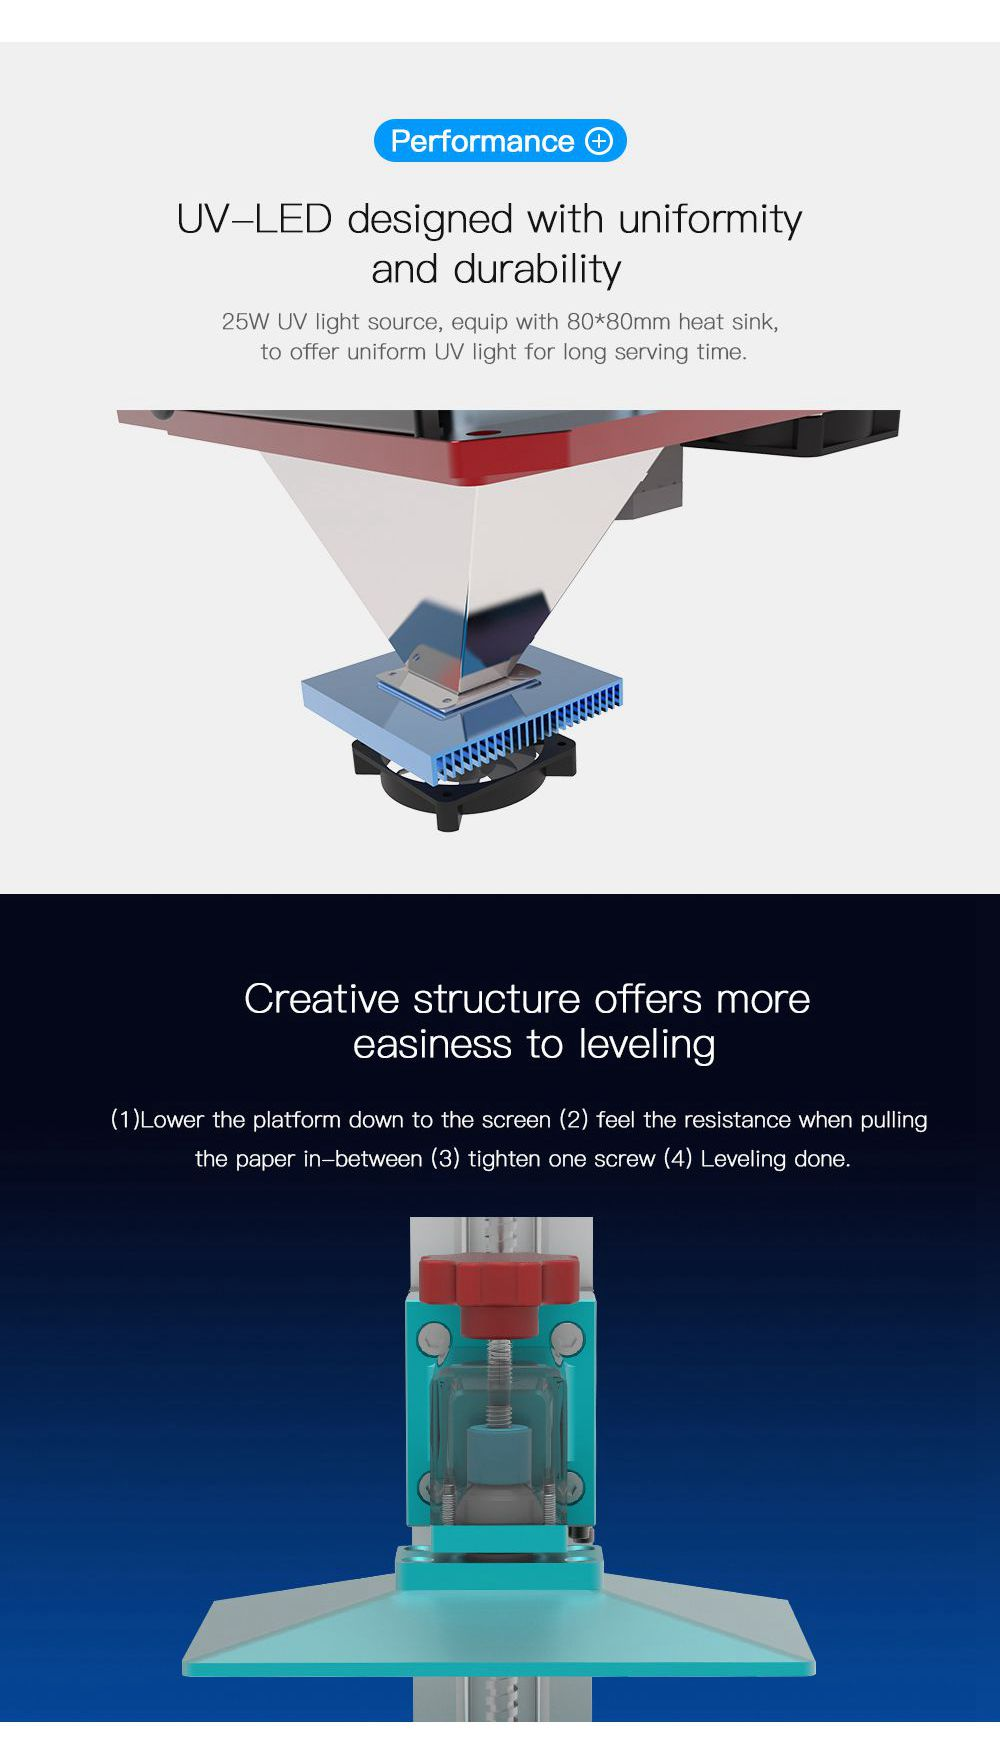 3d-drucker Und 3d-scanner Anycubic 3d Drucker Kit Photon 2l Harz Fep Film Plus Größe Uv-led Touchscreen Sla Uv Harz Impresora 3d Drucker Impressora